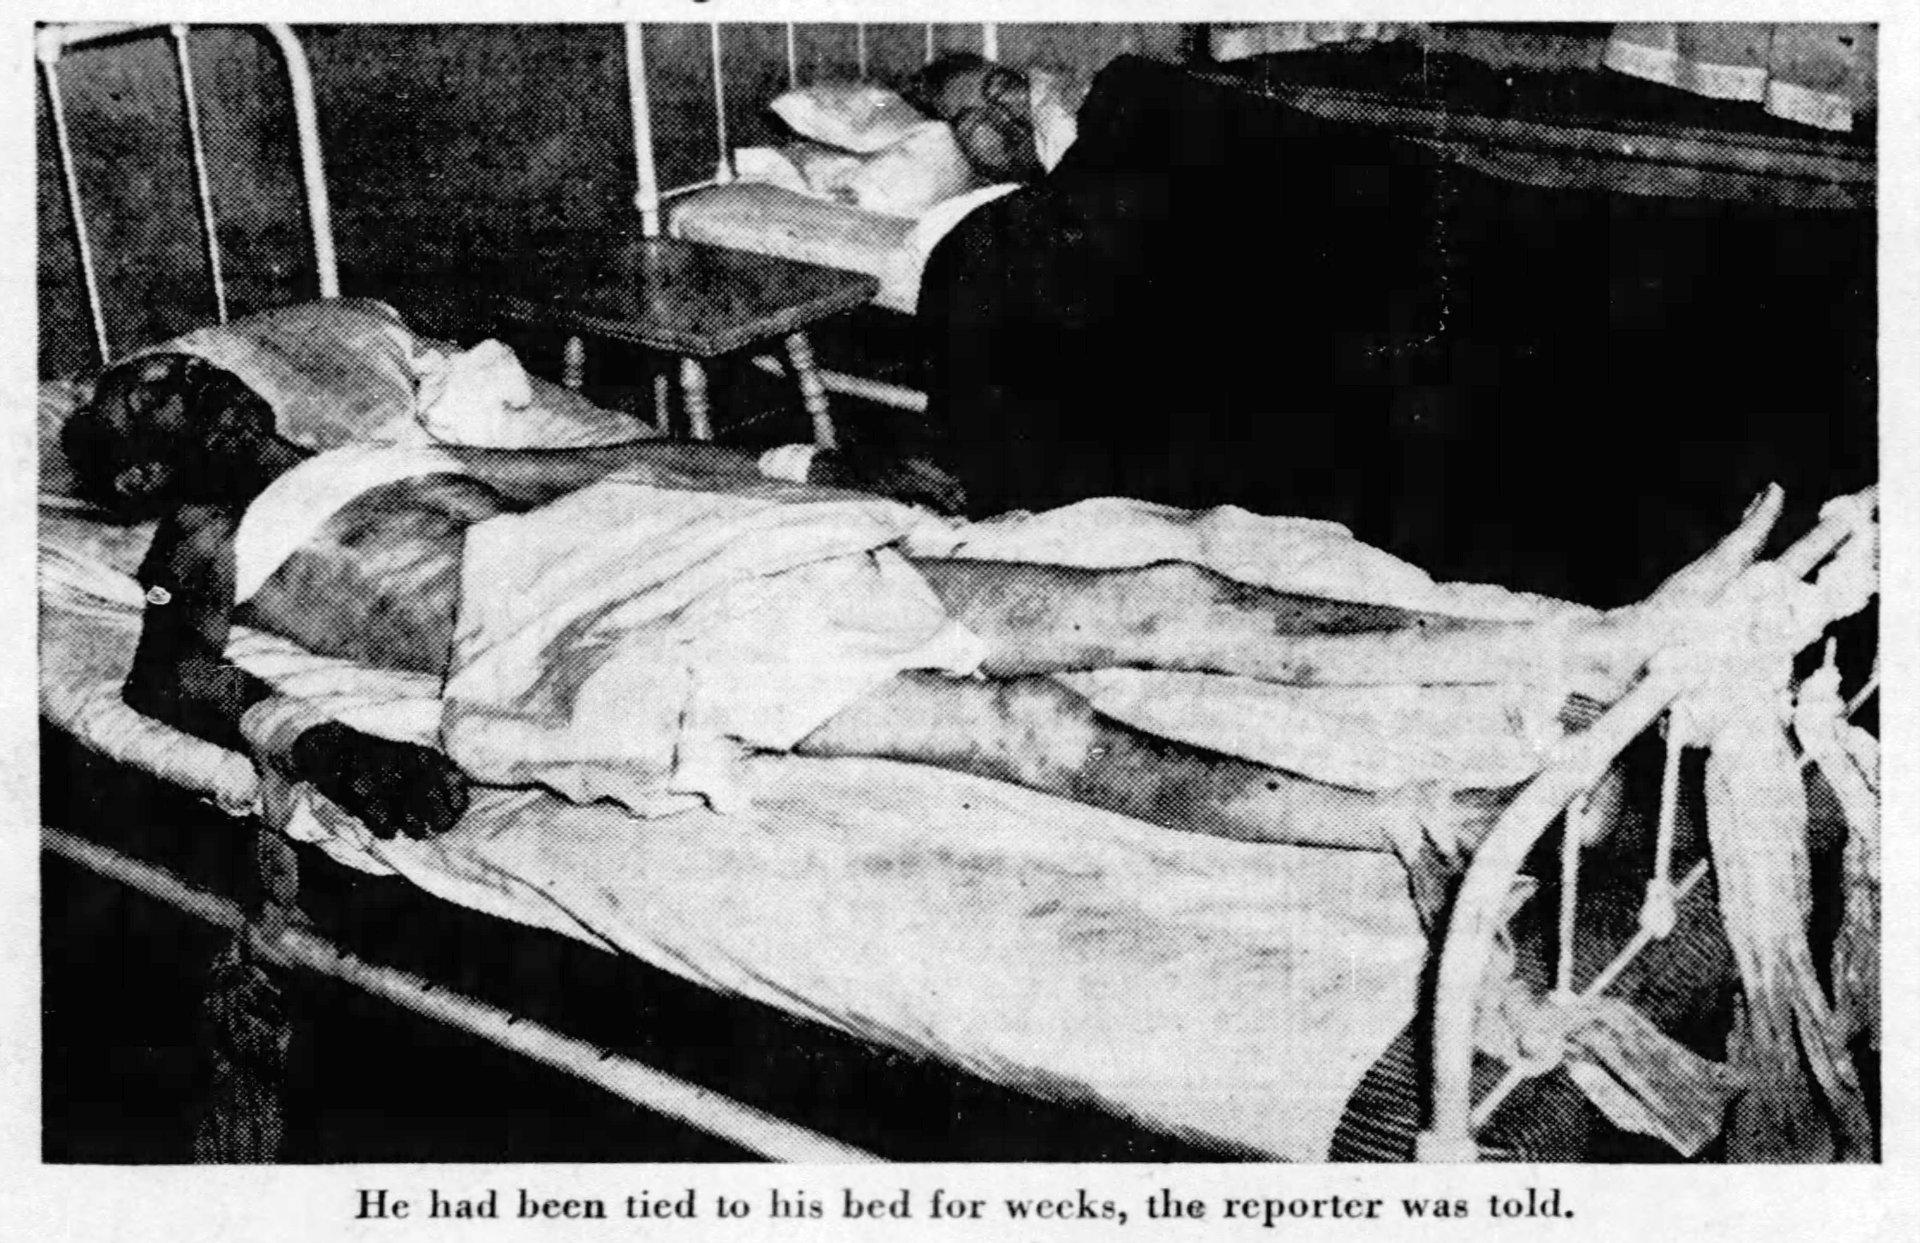 The_Courier_Journal_Sun__Nov_13__1938_ (1)